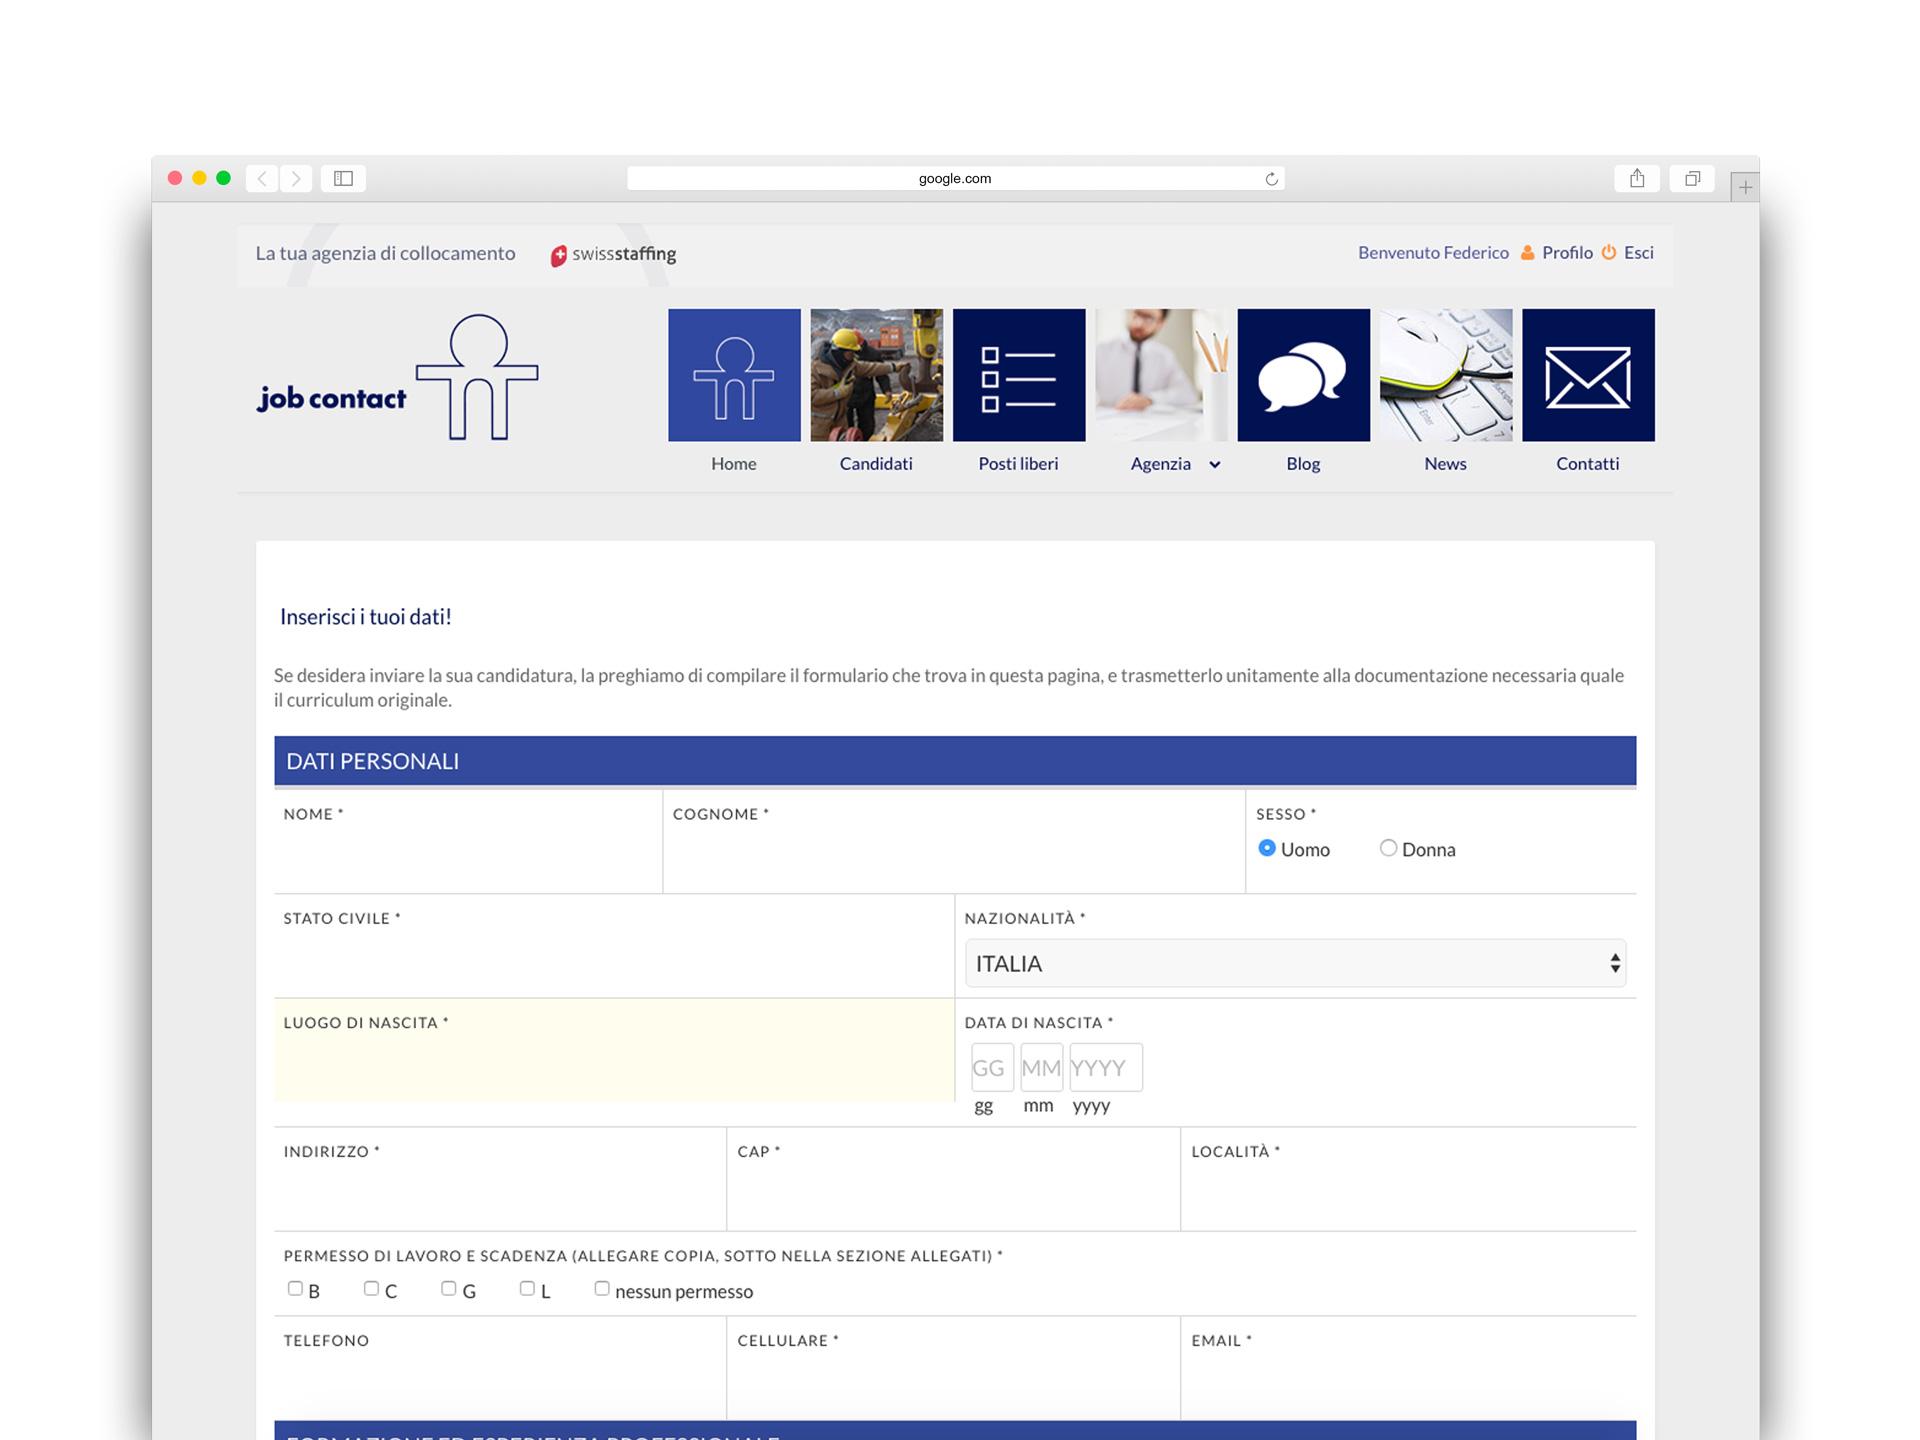 Job Contact form browser